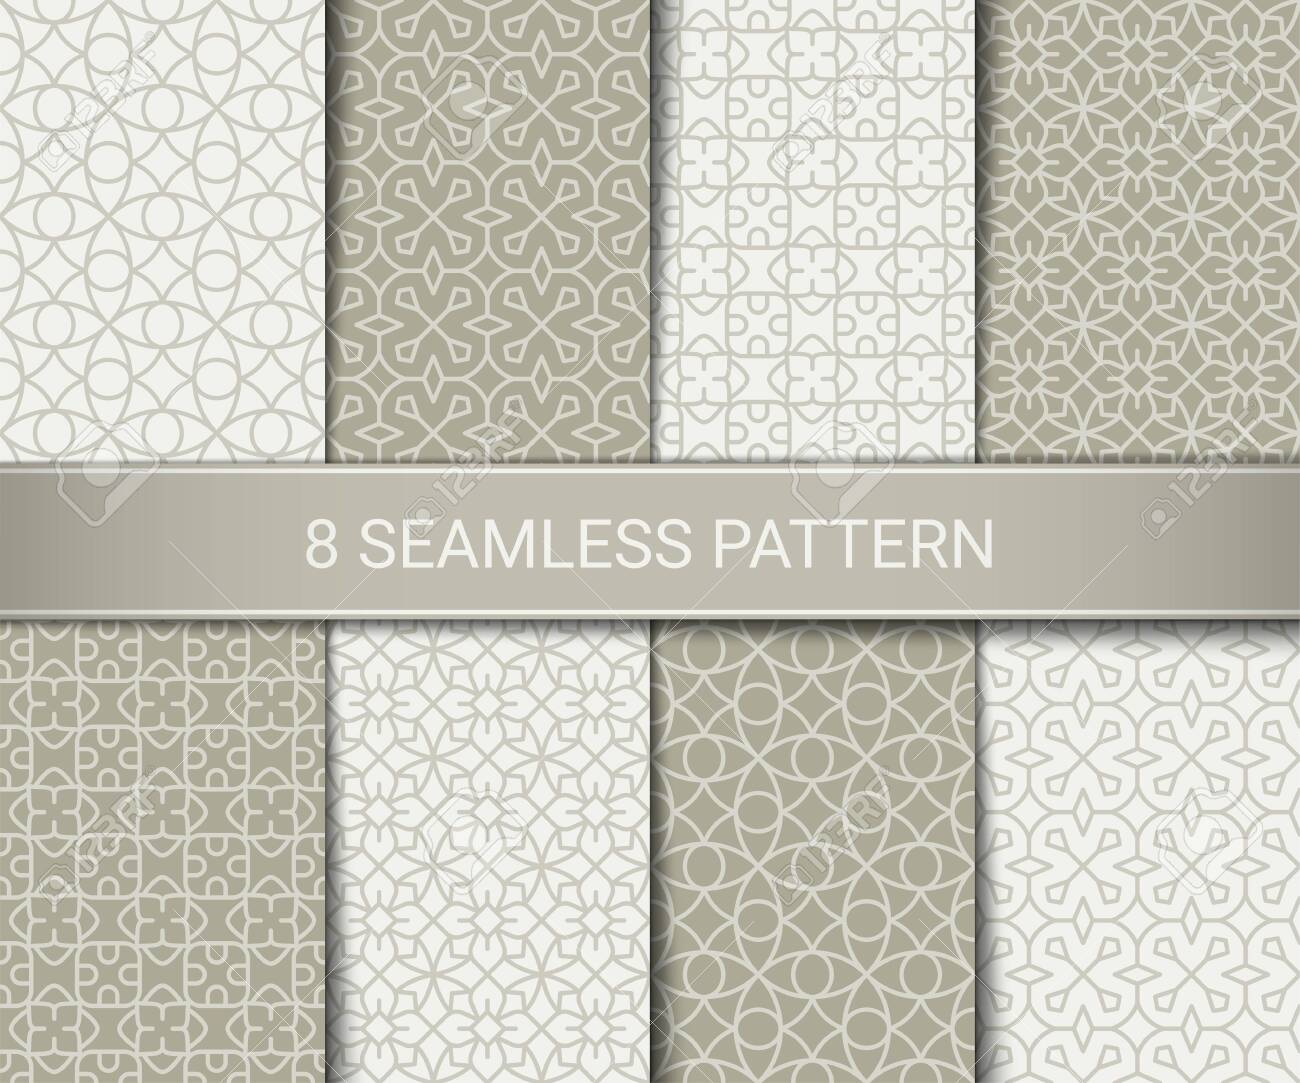 Set of abstract geometric seamless patterns artwork, vector illustration - 146671009